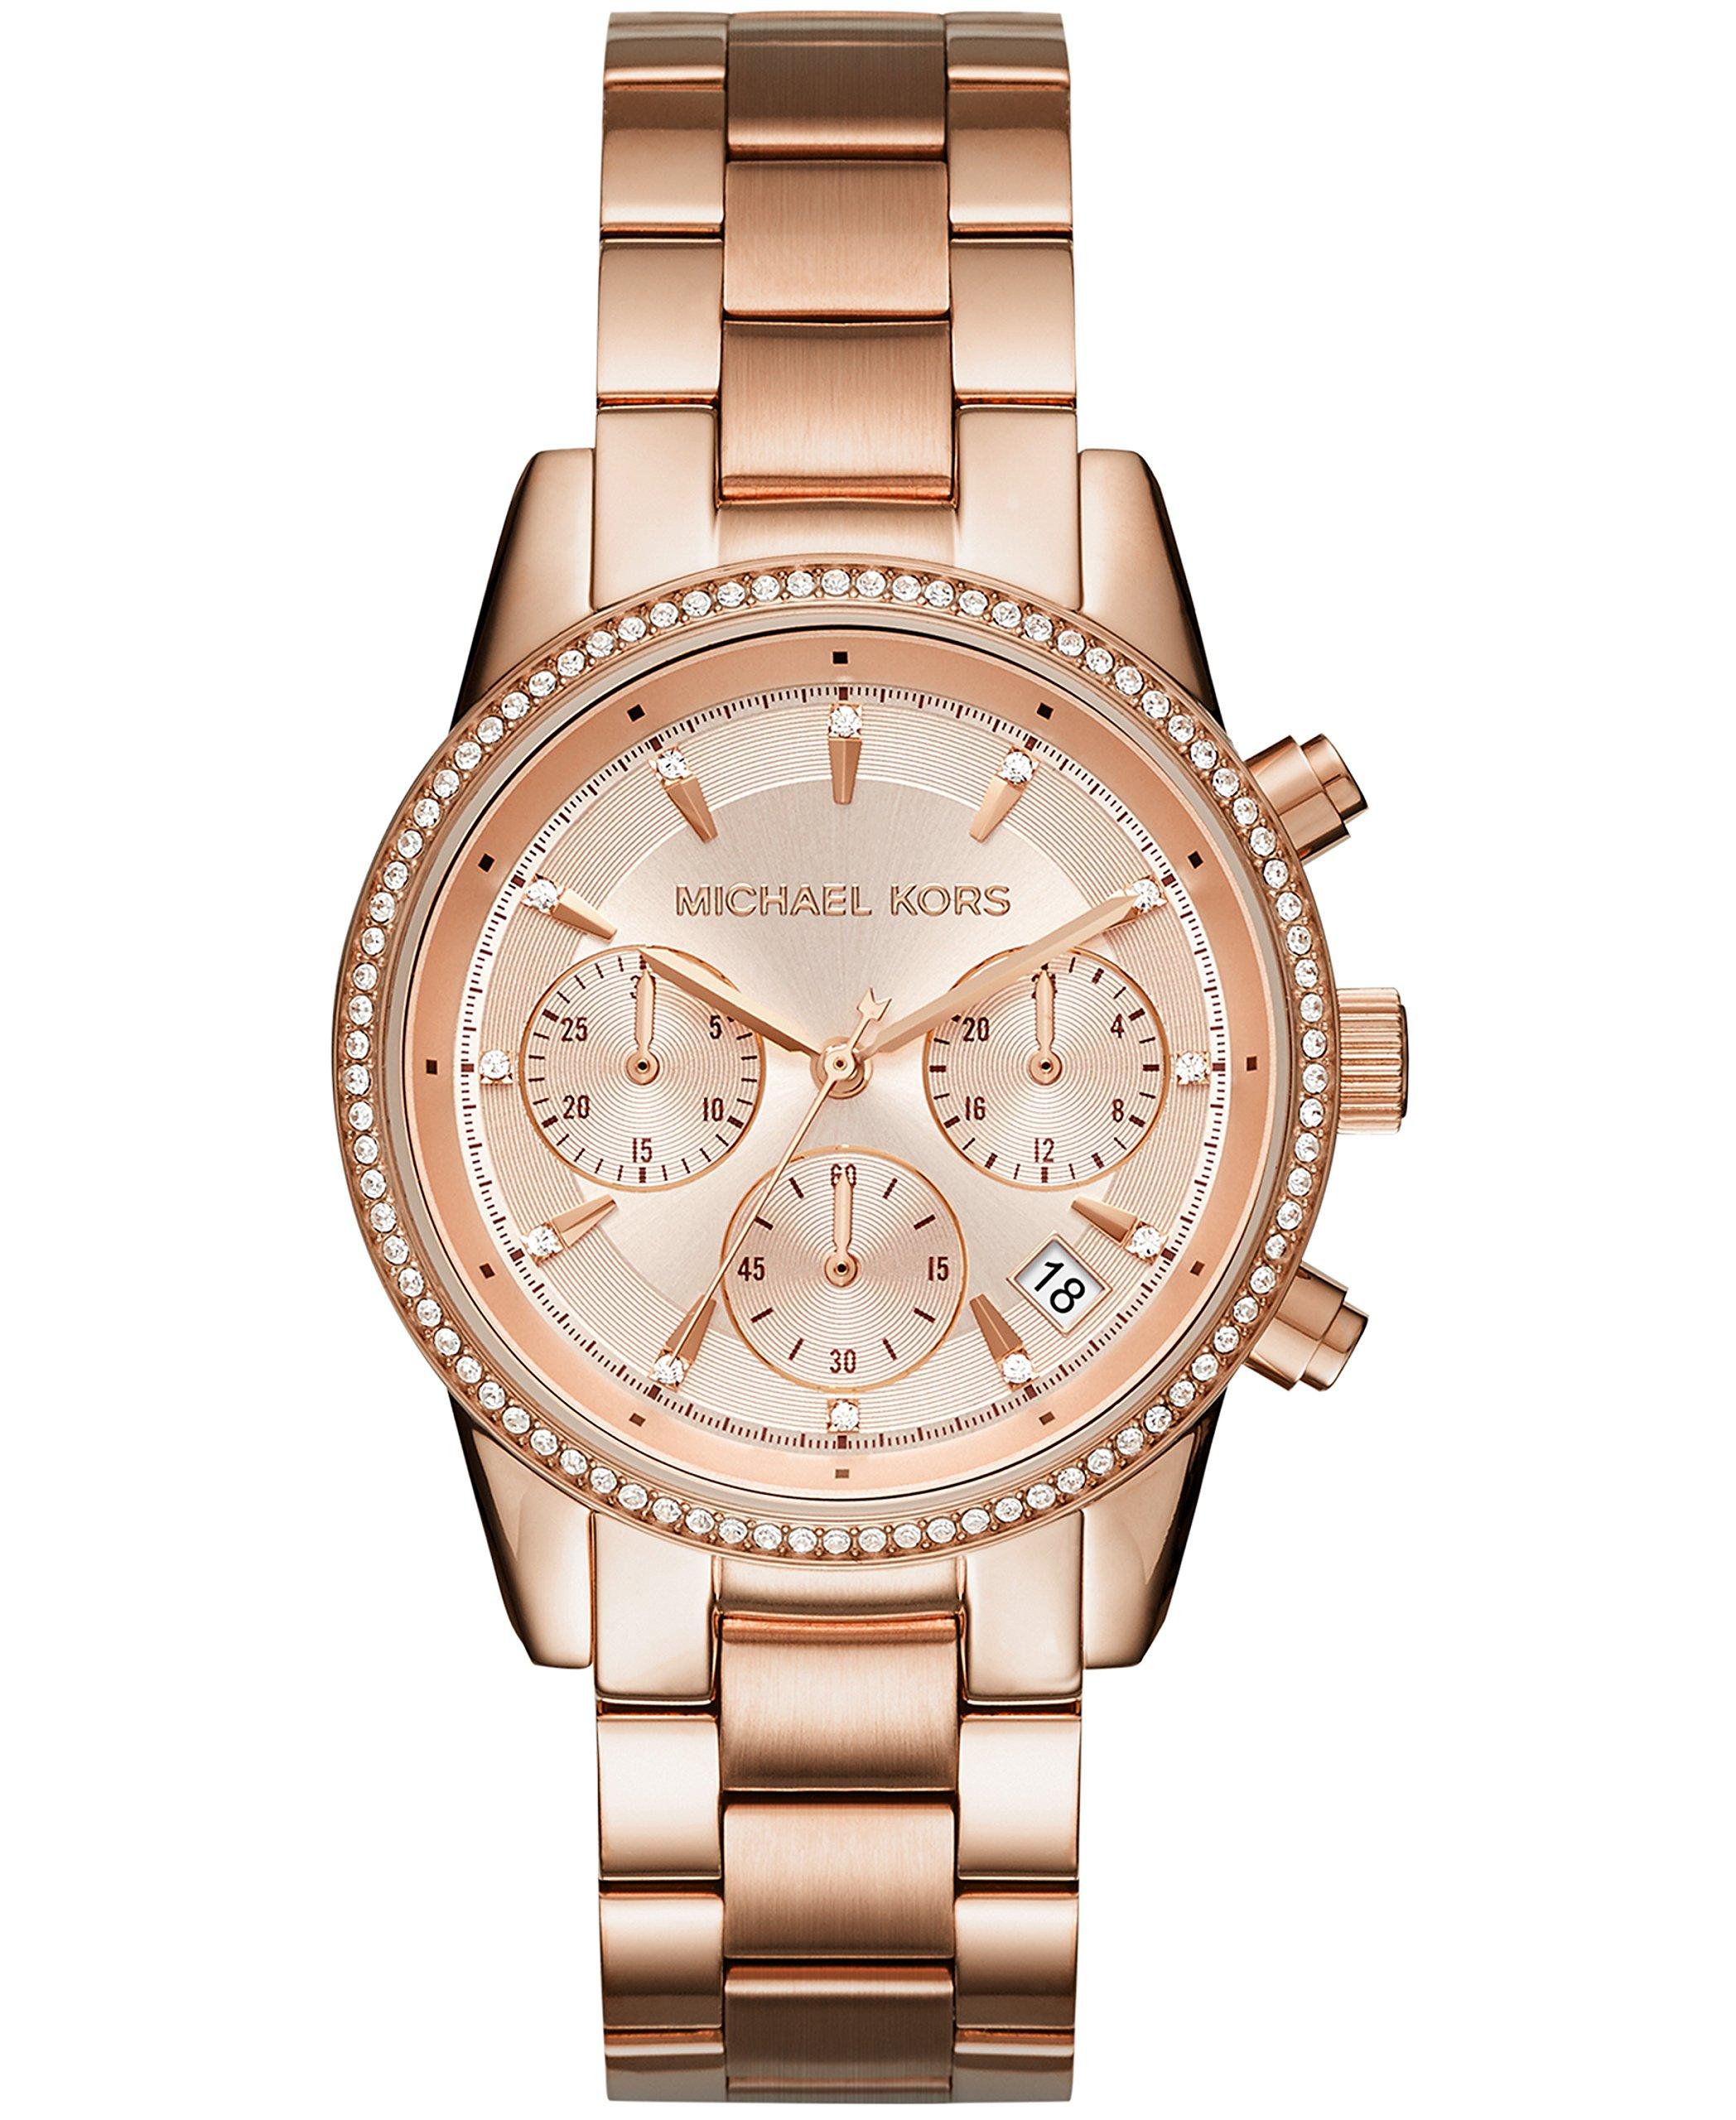 ویکالا · خرید  اصل اورجینال · خرید از آمازون · Michael Kors Women's Ritz Rose Gold-Tone Watch MK6357 wekala · ویکالا